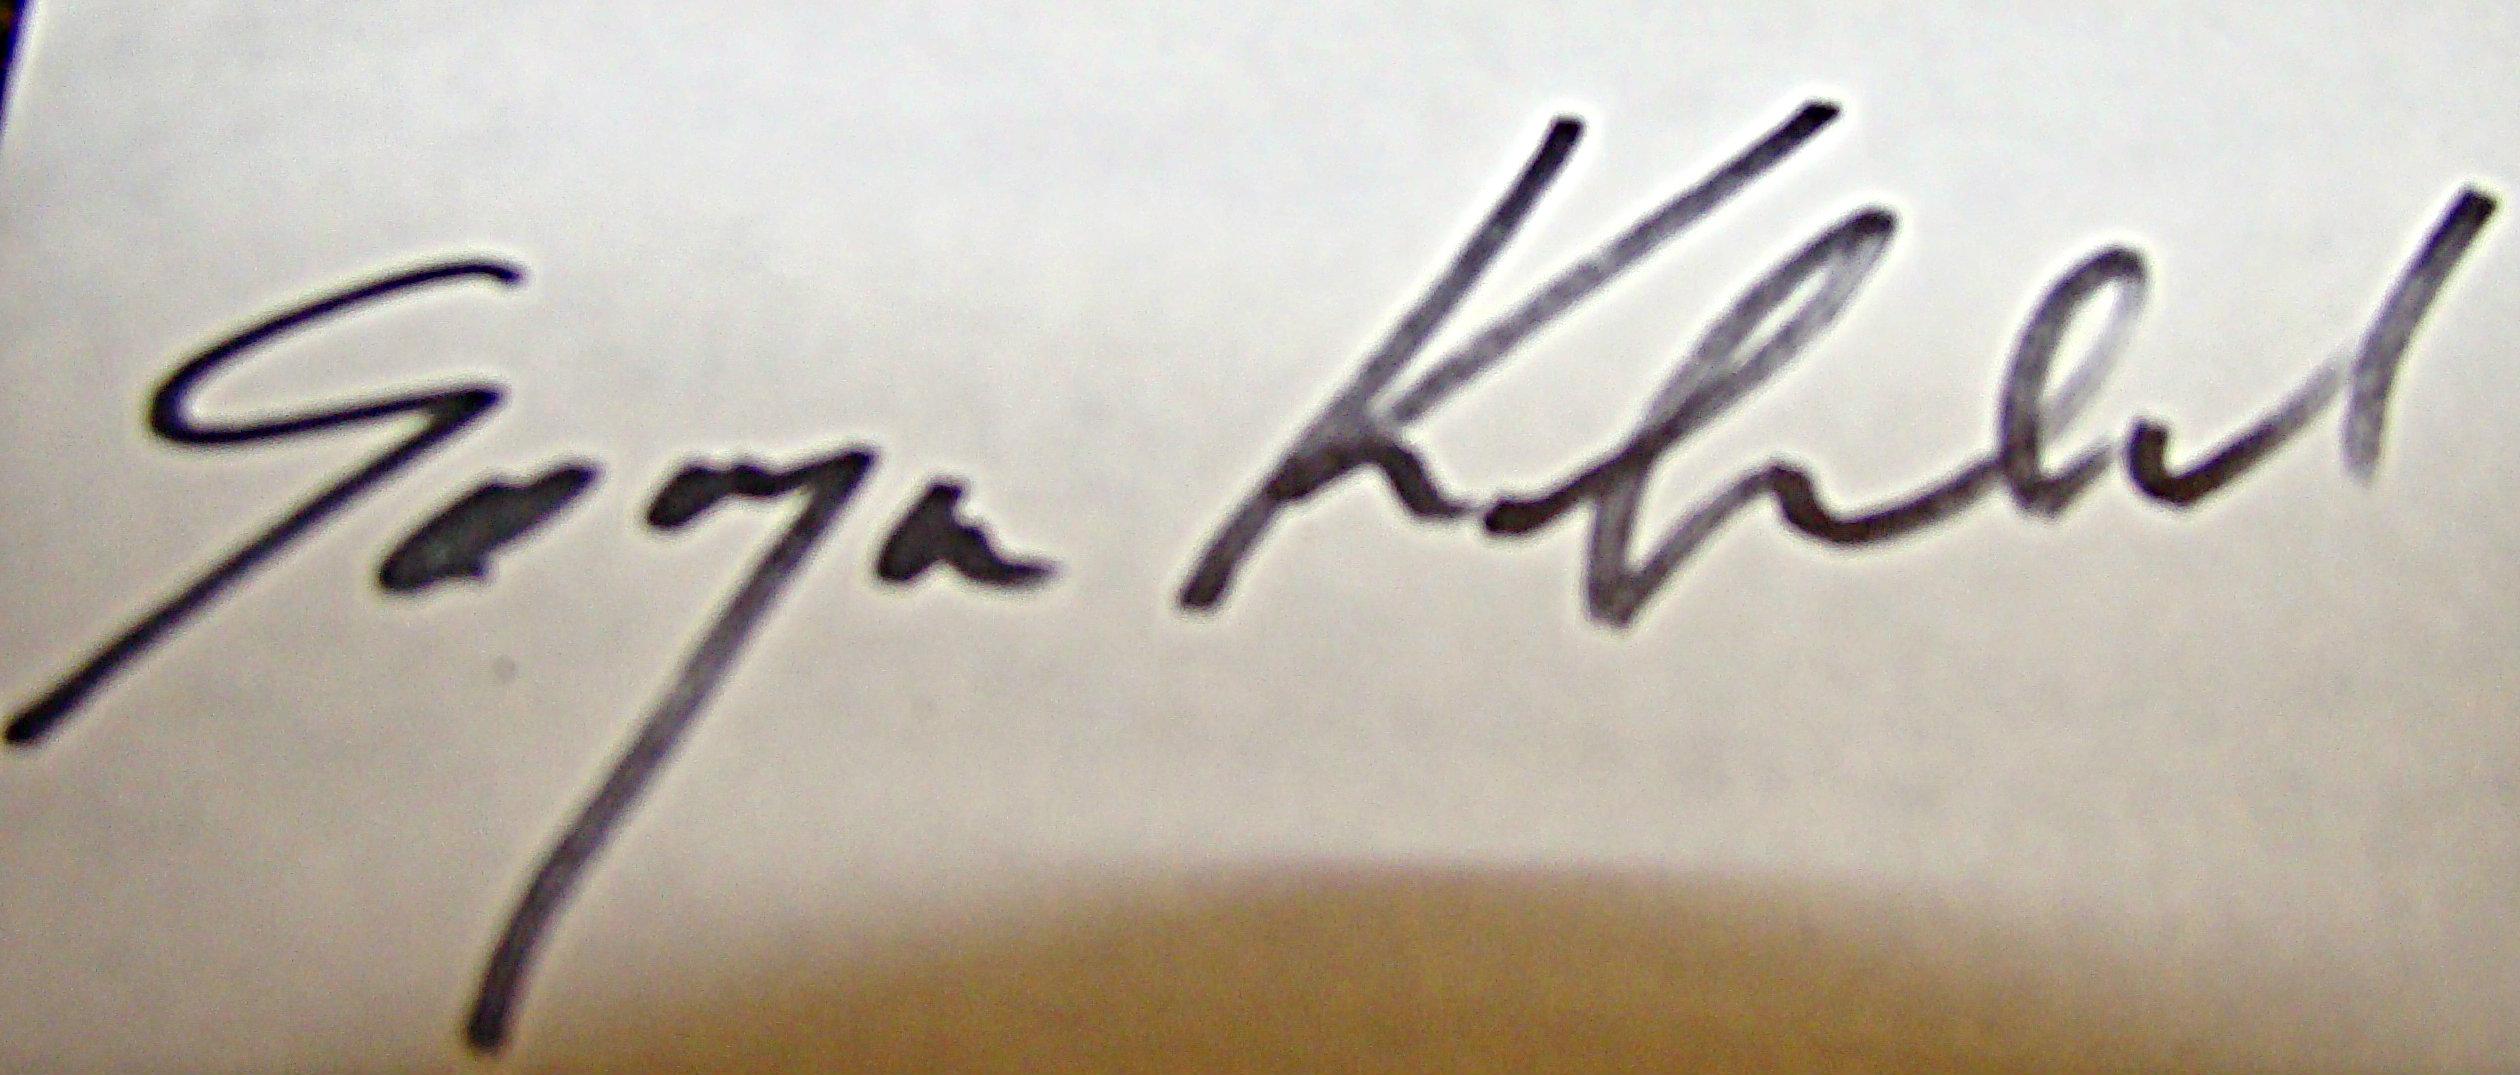 Sonja Kobrehel Signature